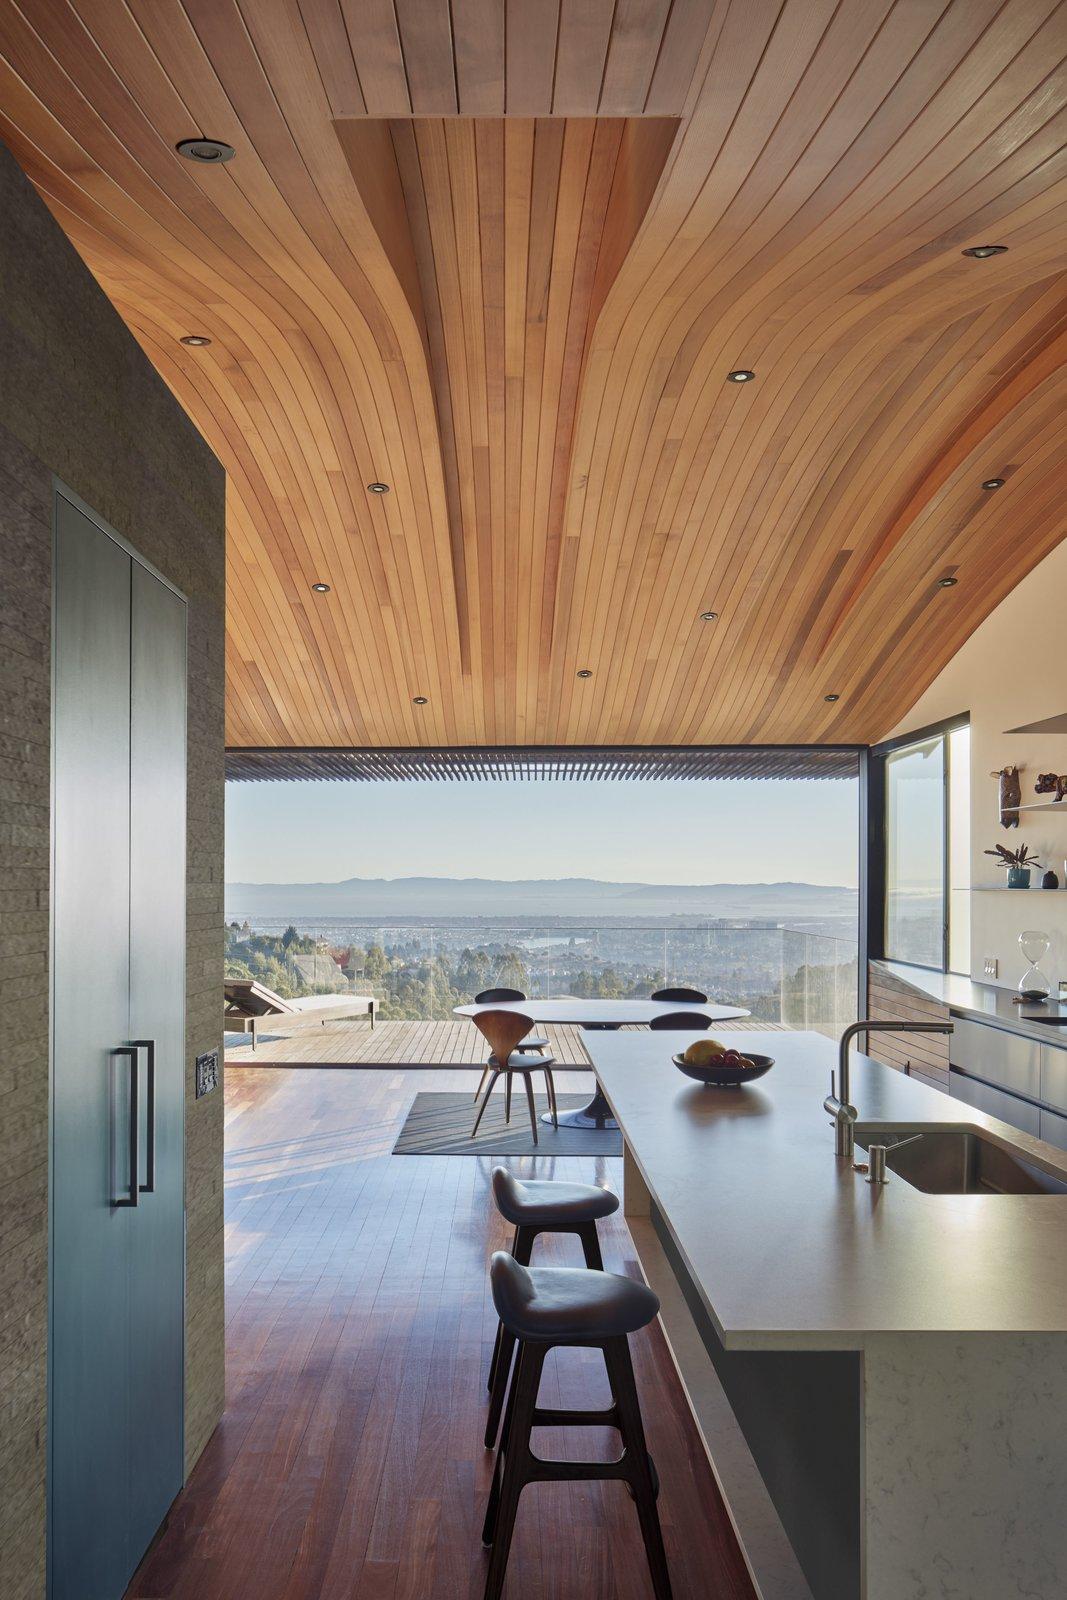 Kitchen, Engineered Quartz Counter, Laminate Cabinet, Medium Hardwood Floor, Undermount Sink, and Recessed Lighting Detail of kitchen  Skyline House by Terry & Terry Architecture